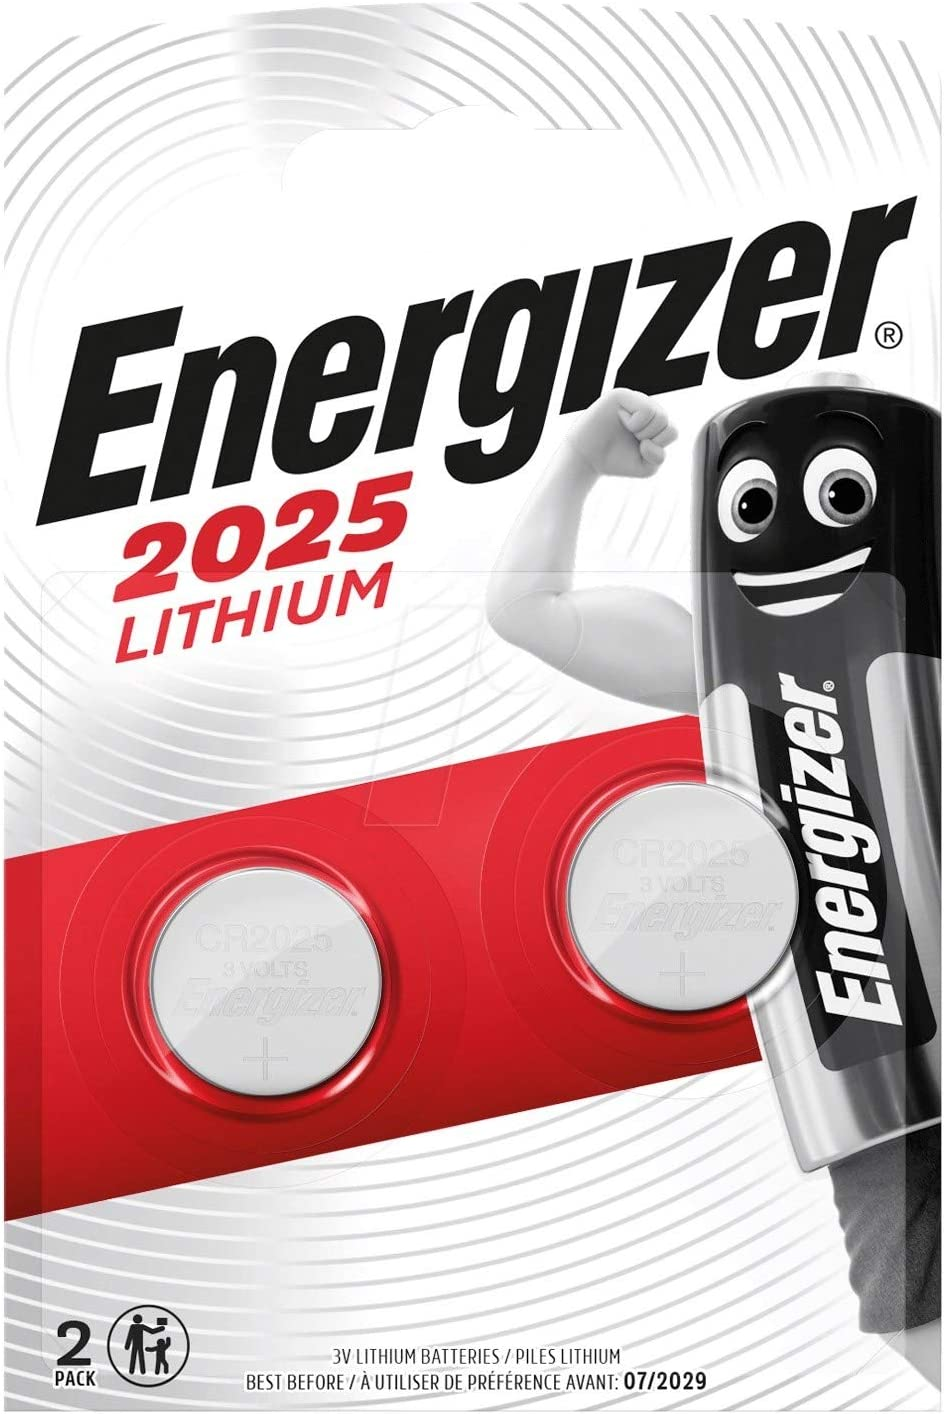 Energizer Cr123 Batterien Lithium Knopfzelle 2 Stück Elektronik